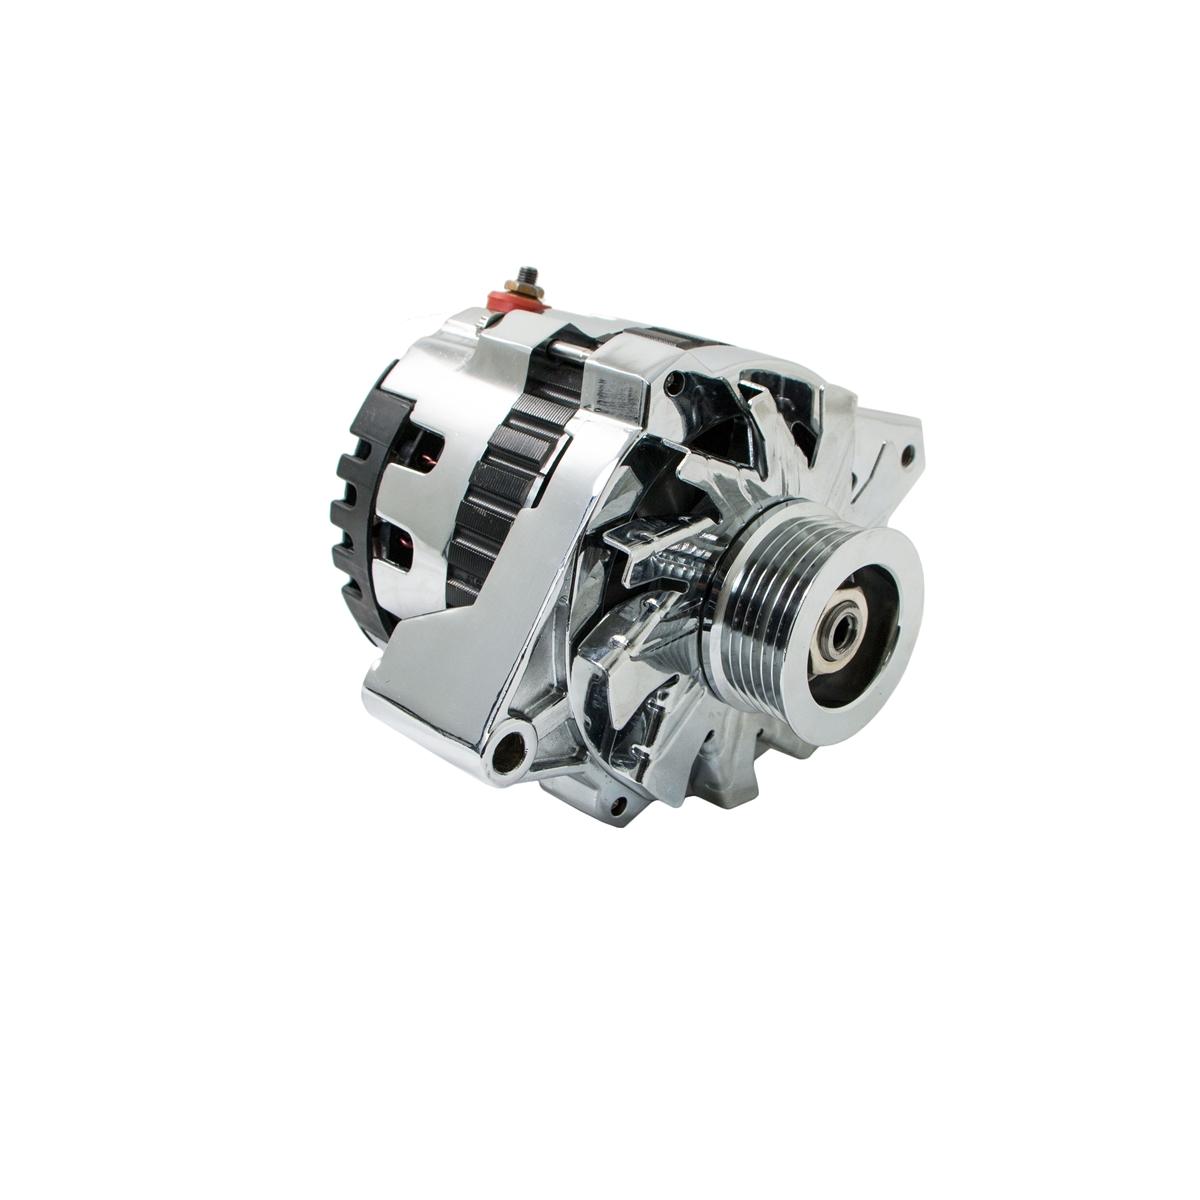 hight resolution of universal gm chevy serpentine high output chrome alternator 160 amp 1 wire cs130